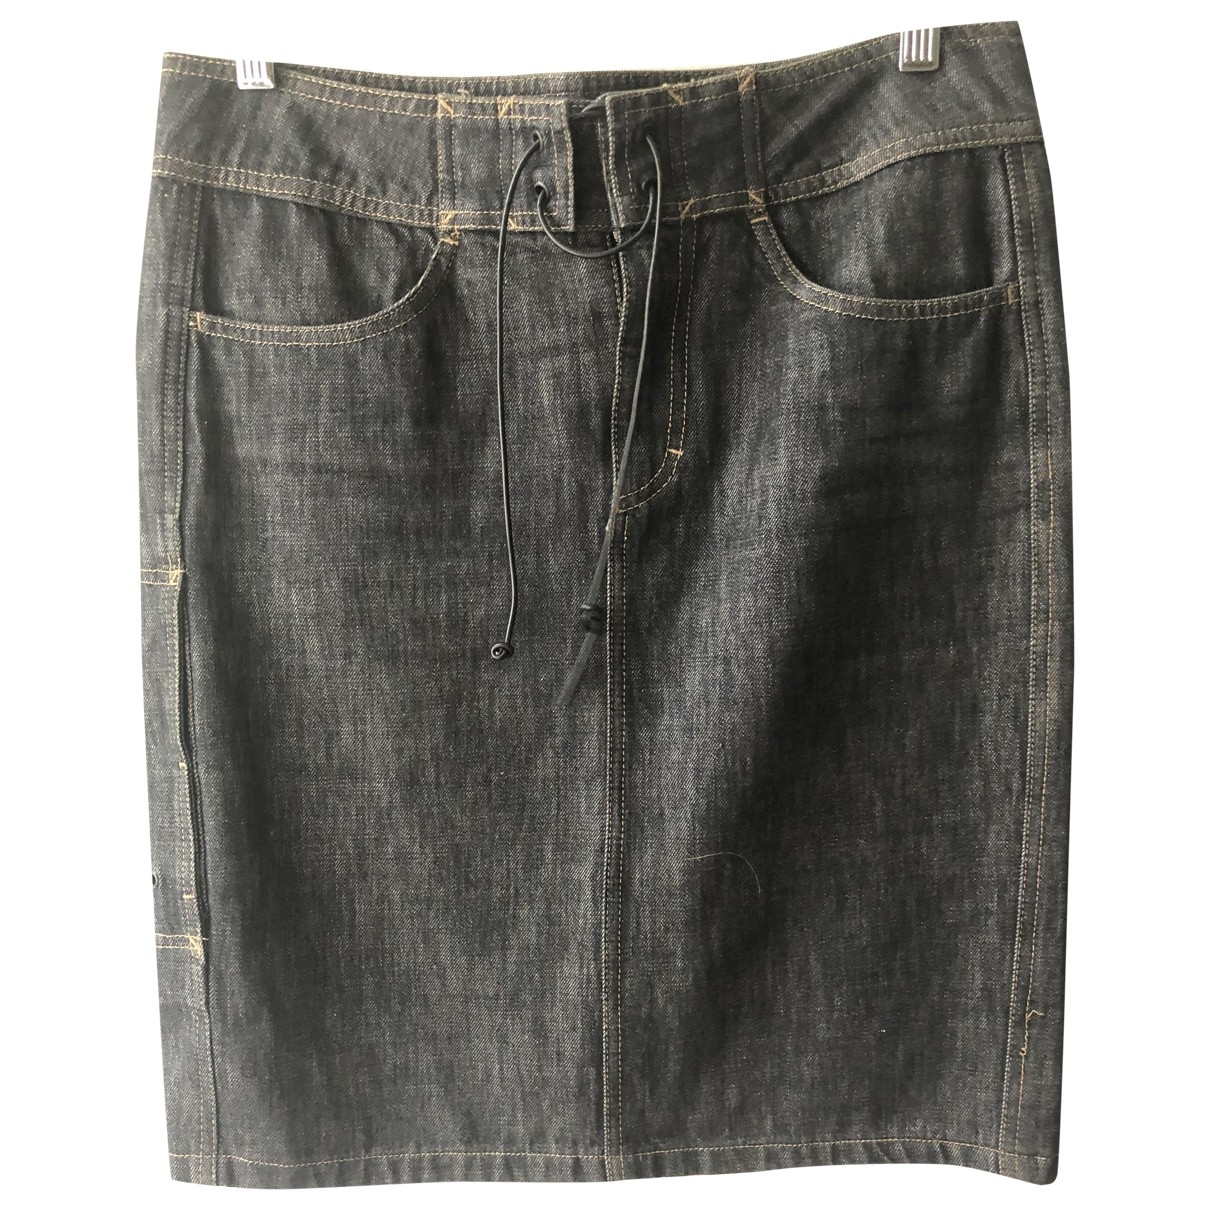 Gucci \N Black Denim - Jeans skirt for Women 42 IT